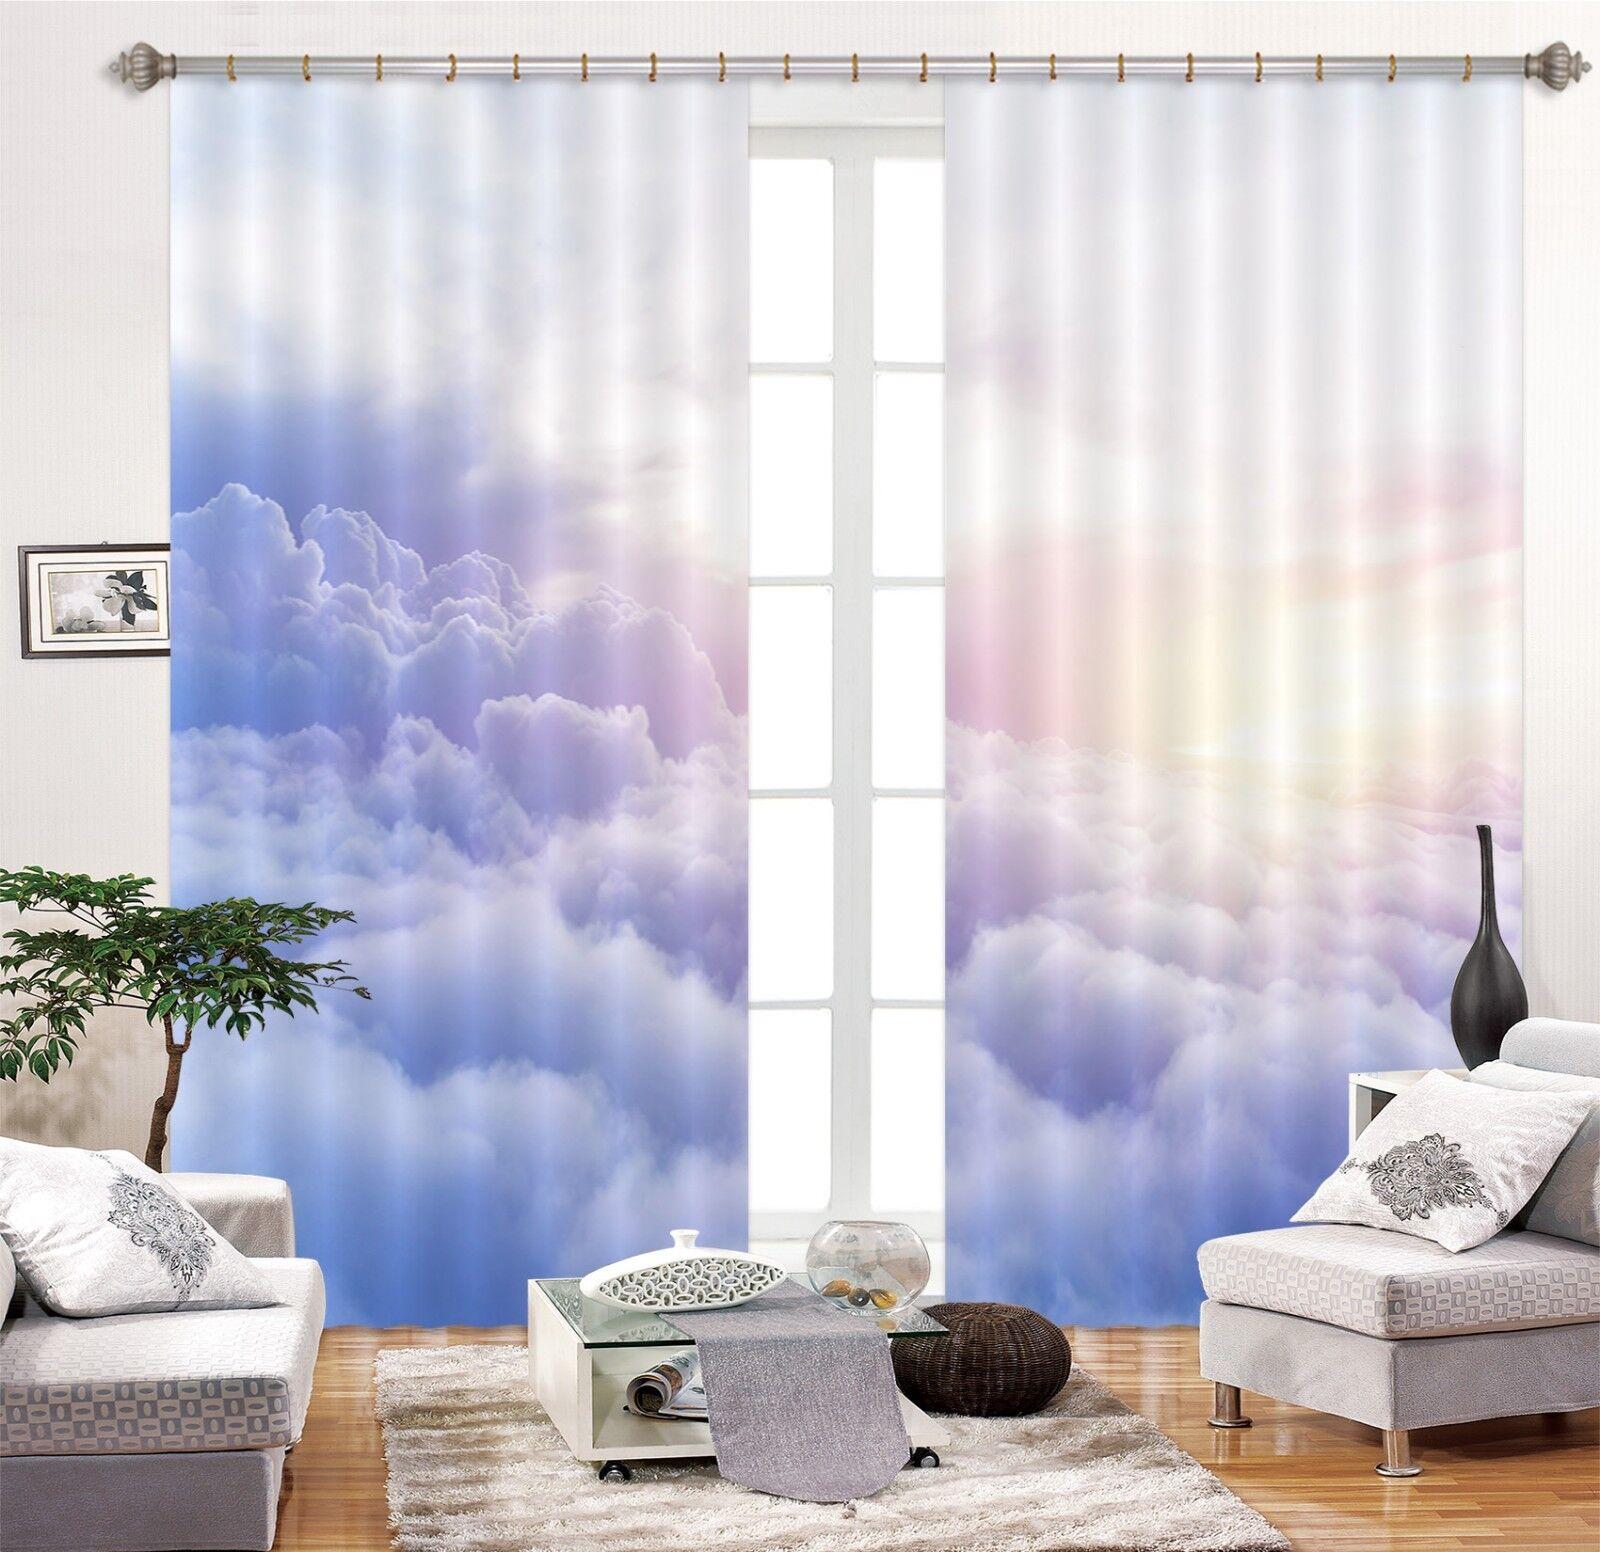 3d cielo nuvole 67 blocco foto sipario pressione sipario tende tessuto finestra de